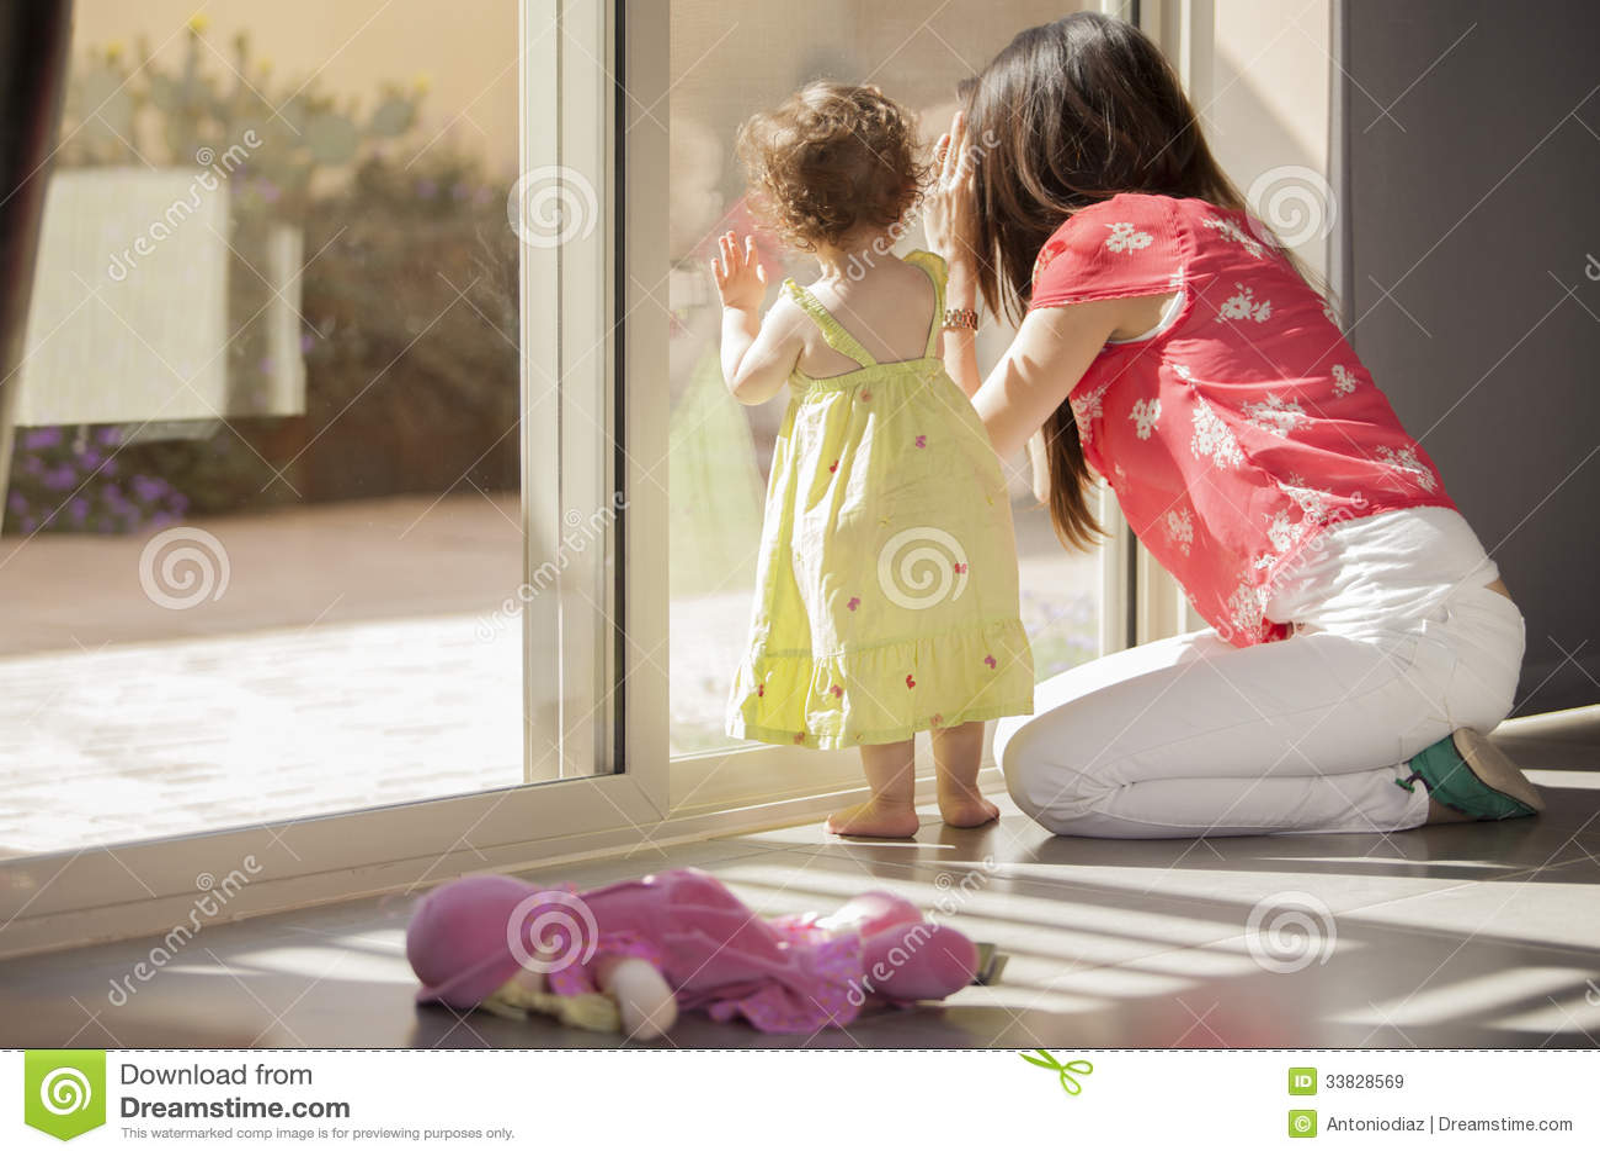 Смотрят на член через окно 1 фотография